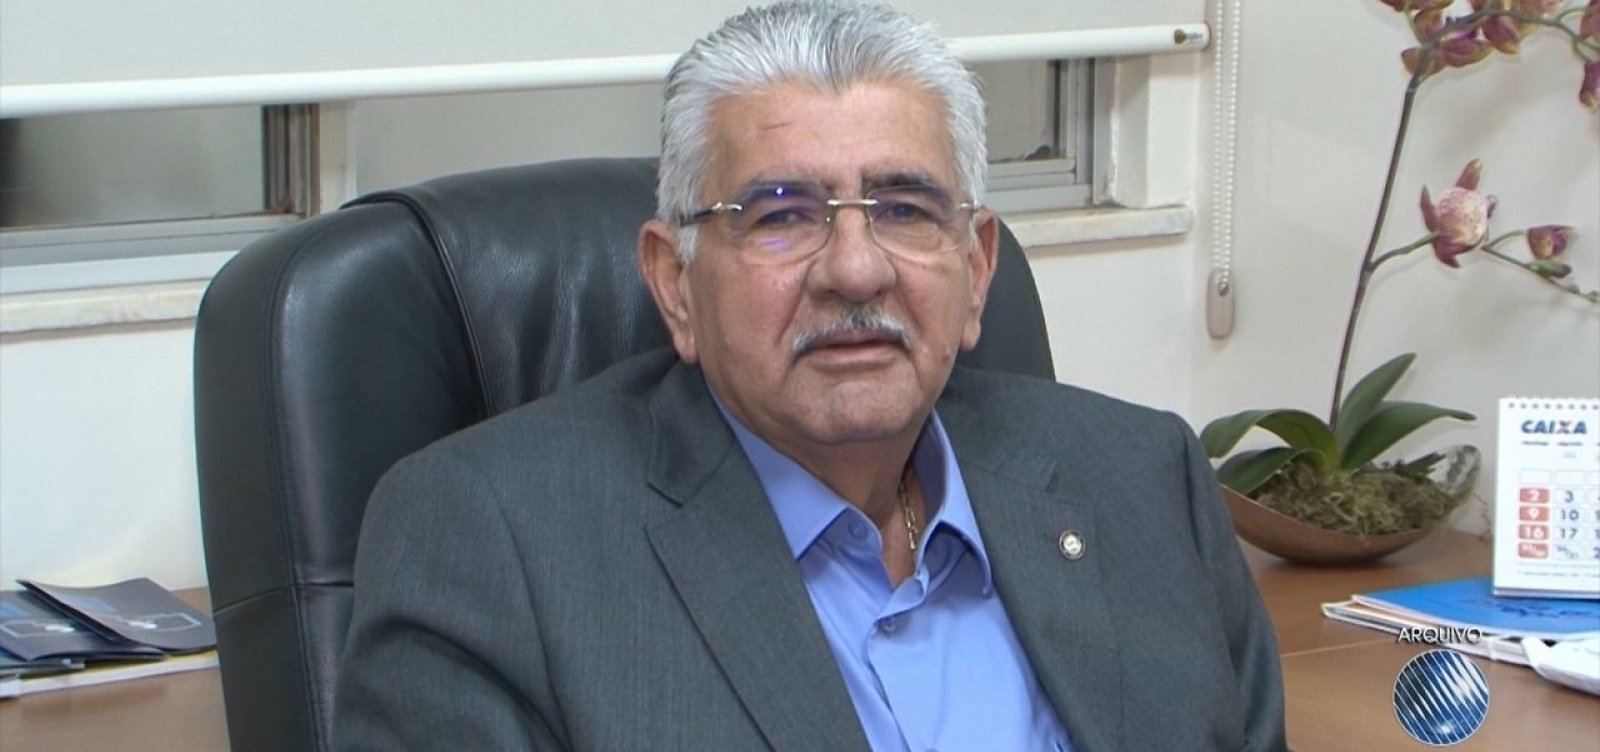 [TCM-BA condena ex-prefeito de Barreiras a ressarcir R$ 62 mil aos cofres municipais]